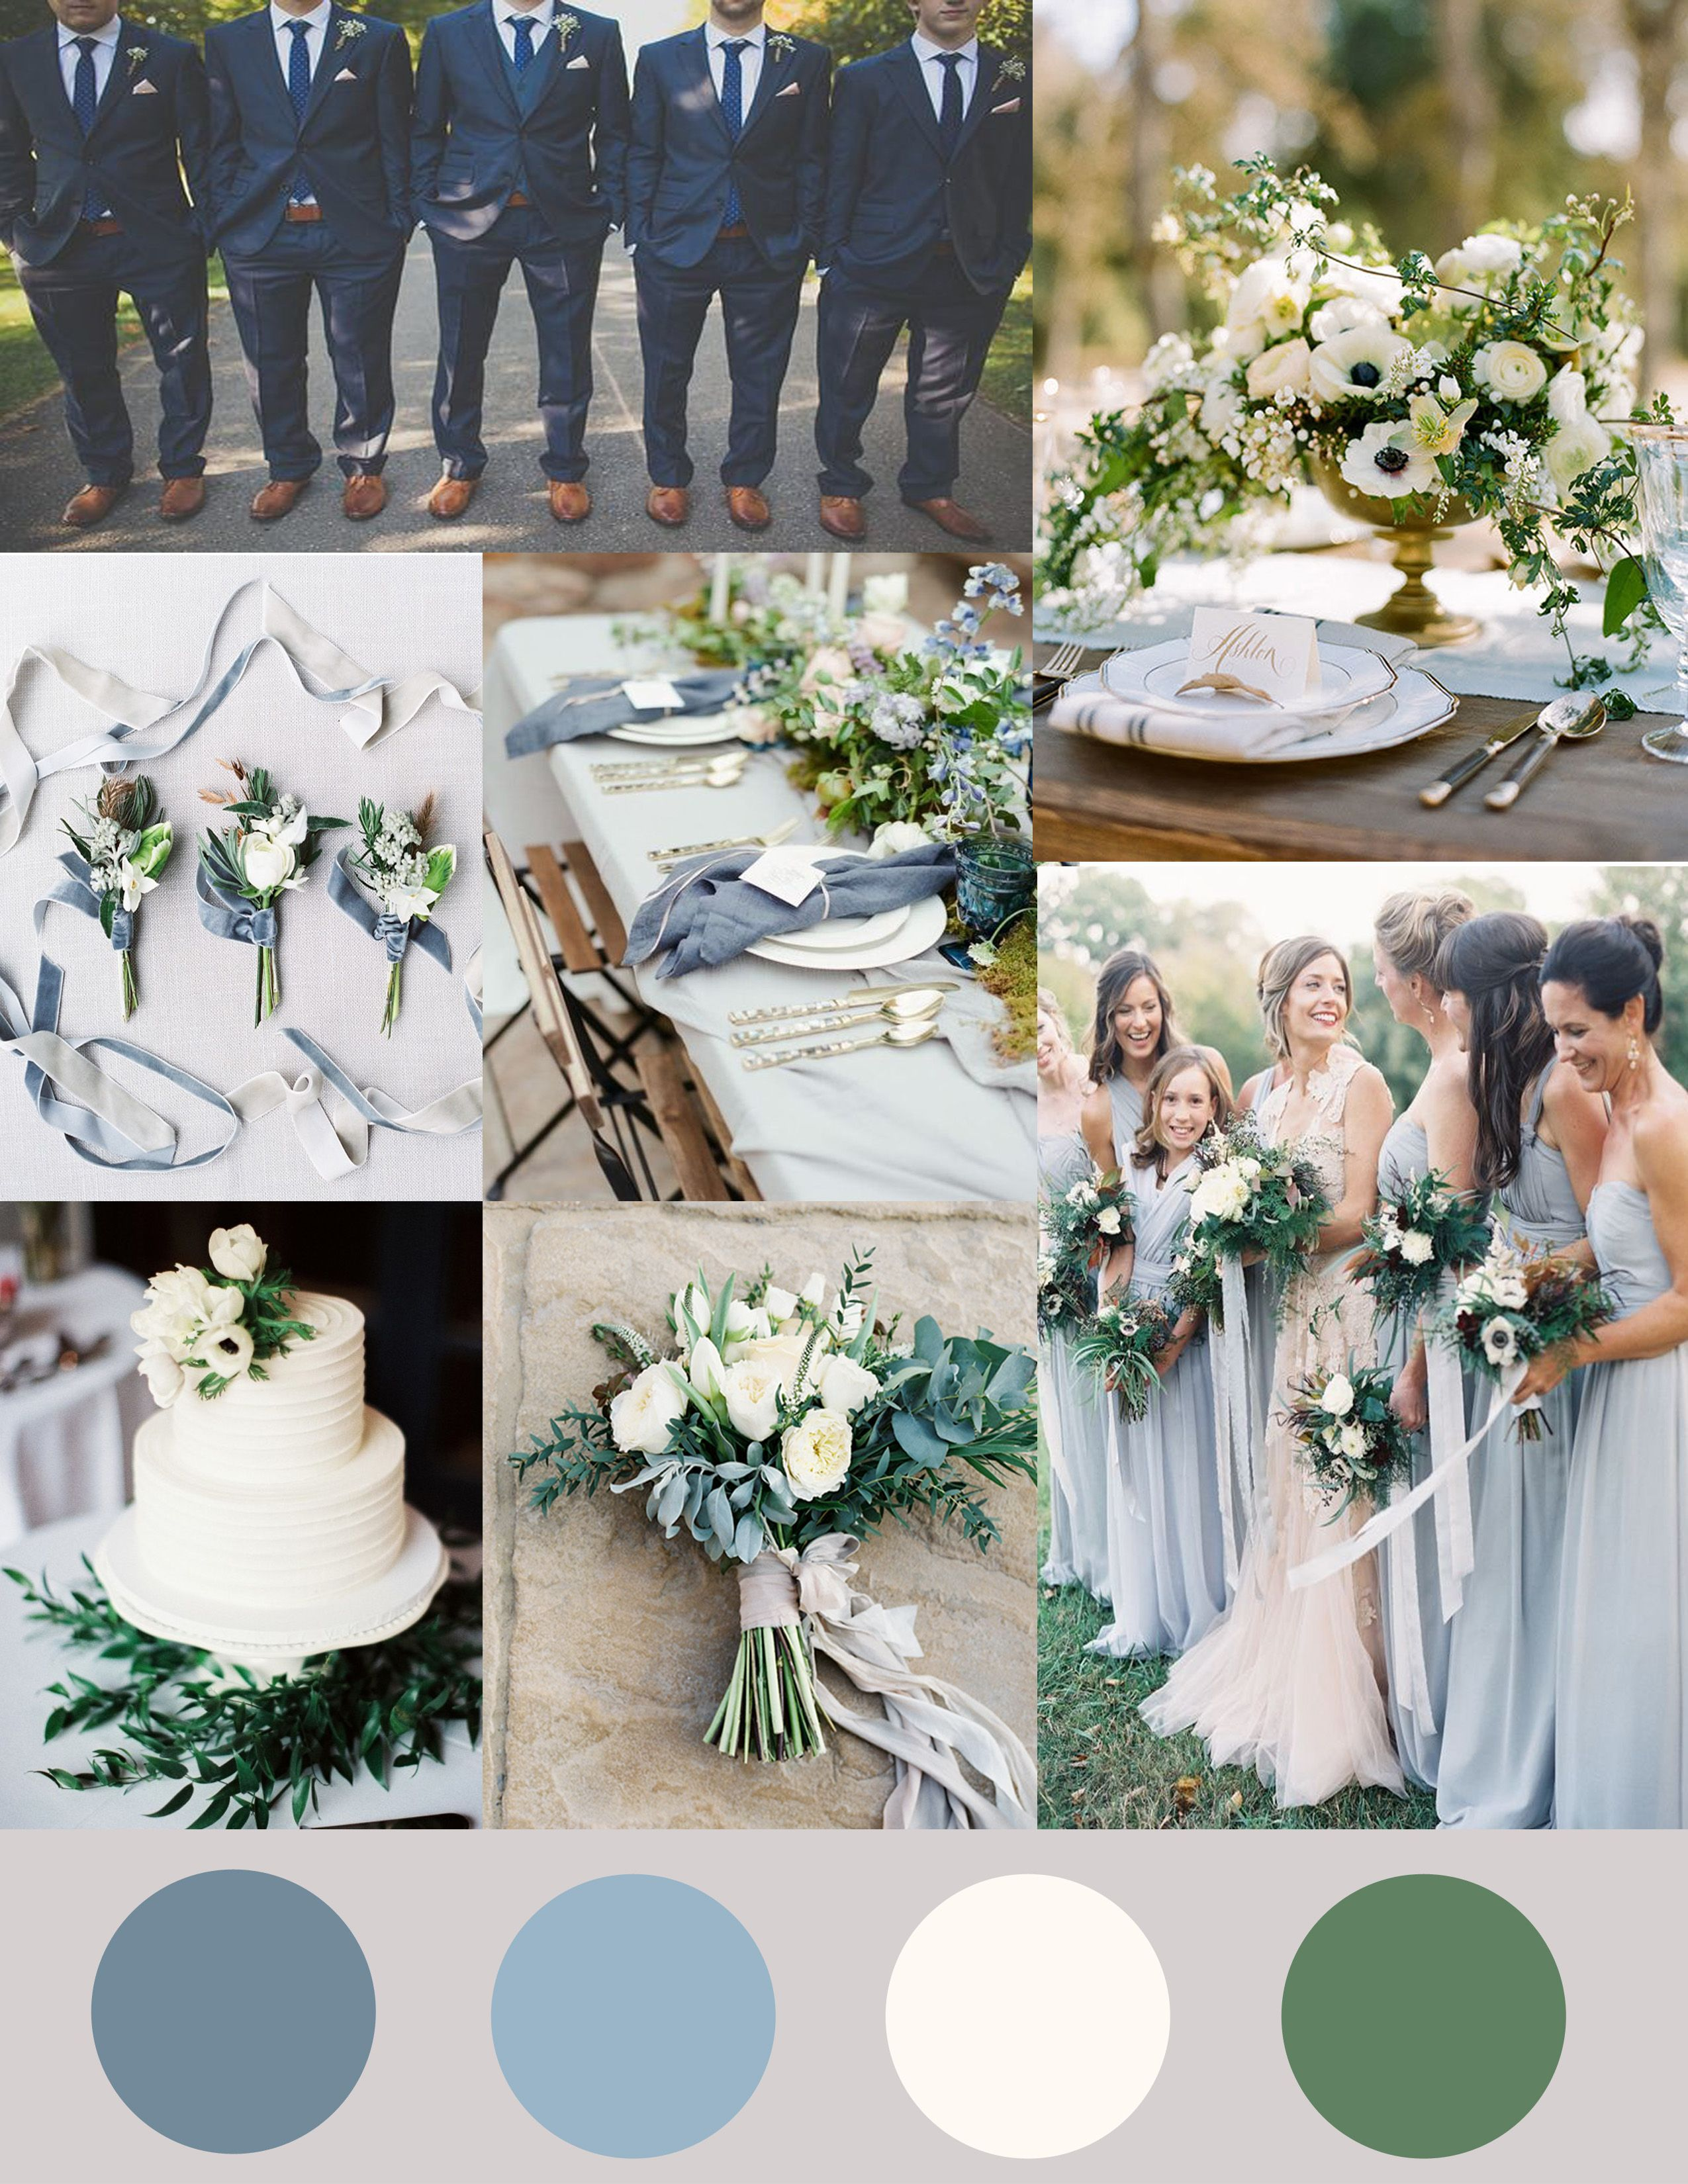 Wedding decorations yellow and blue november 2018 Shades of Dusty Blue Ivory and Greenery Wedding   Wedding